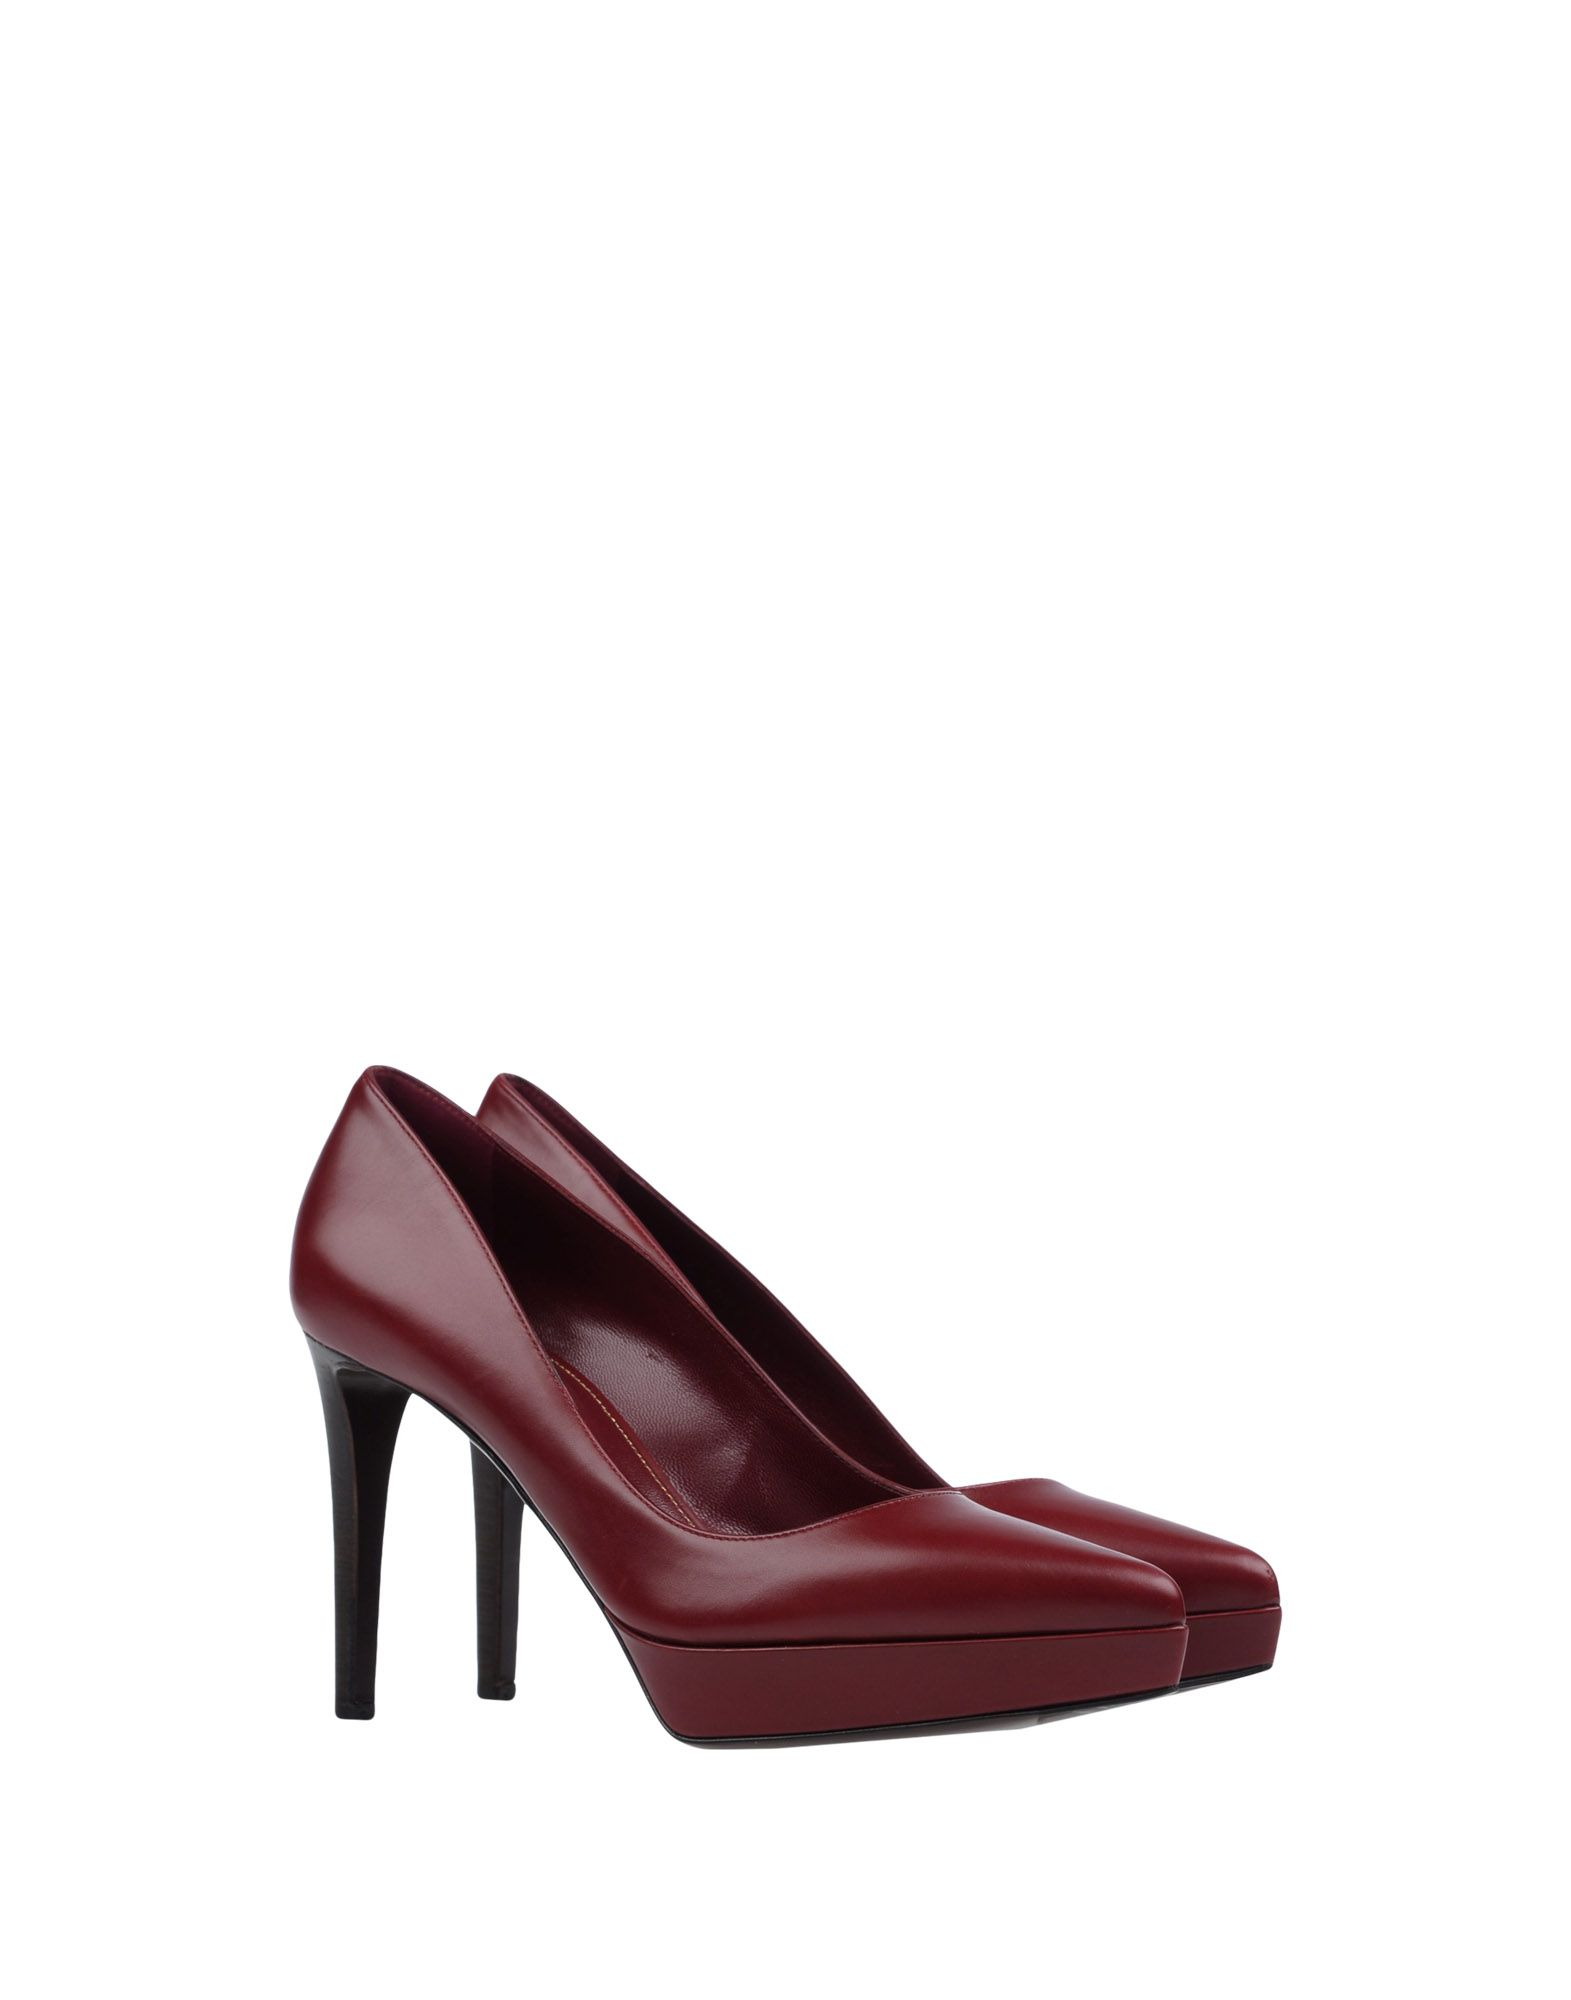 Sergio Rossi Pumps Damen strapazierfähige  11284578HCGut aussehende strapazierfähige Damen Schuhe 225151